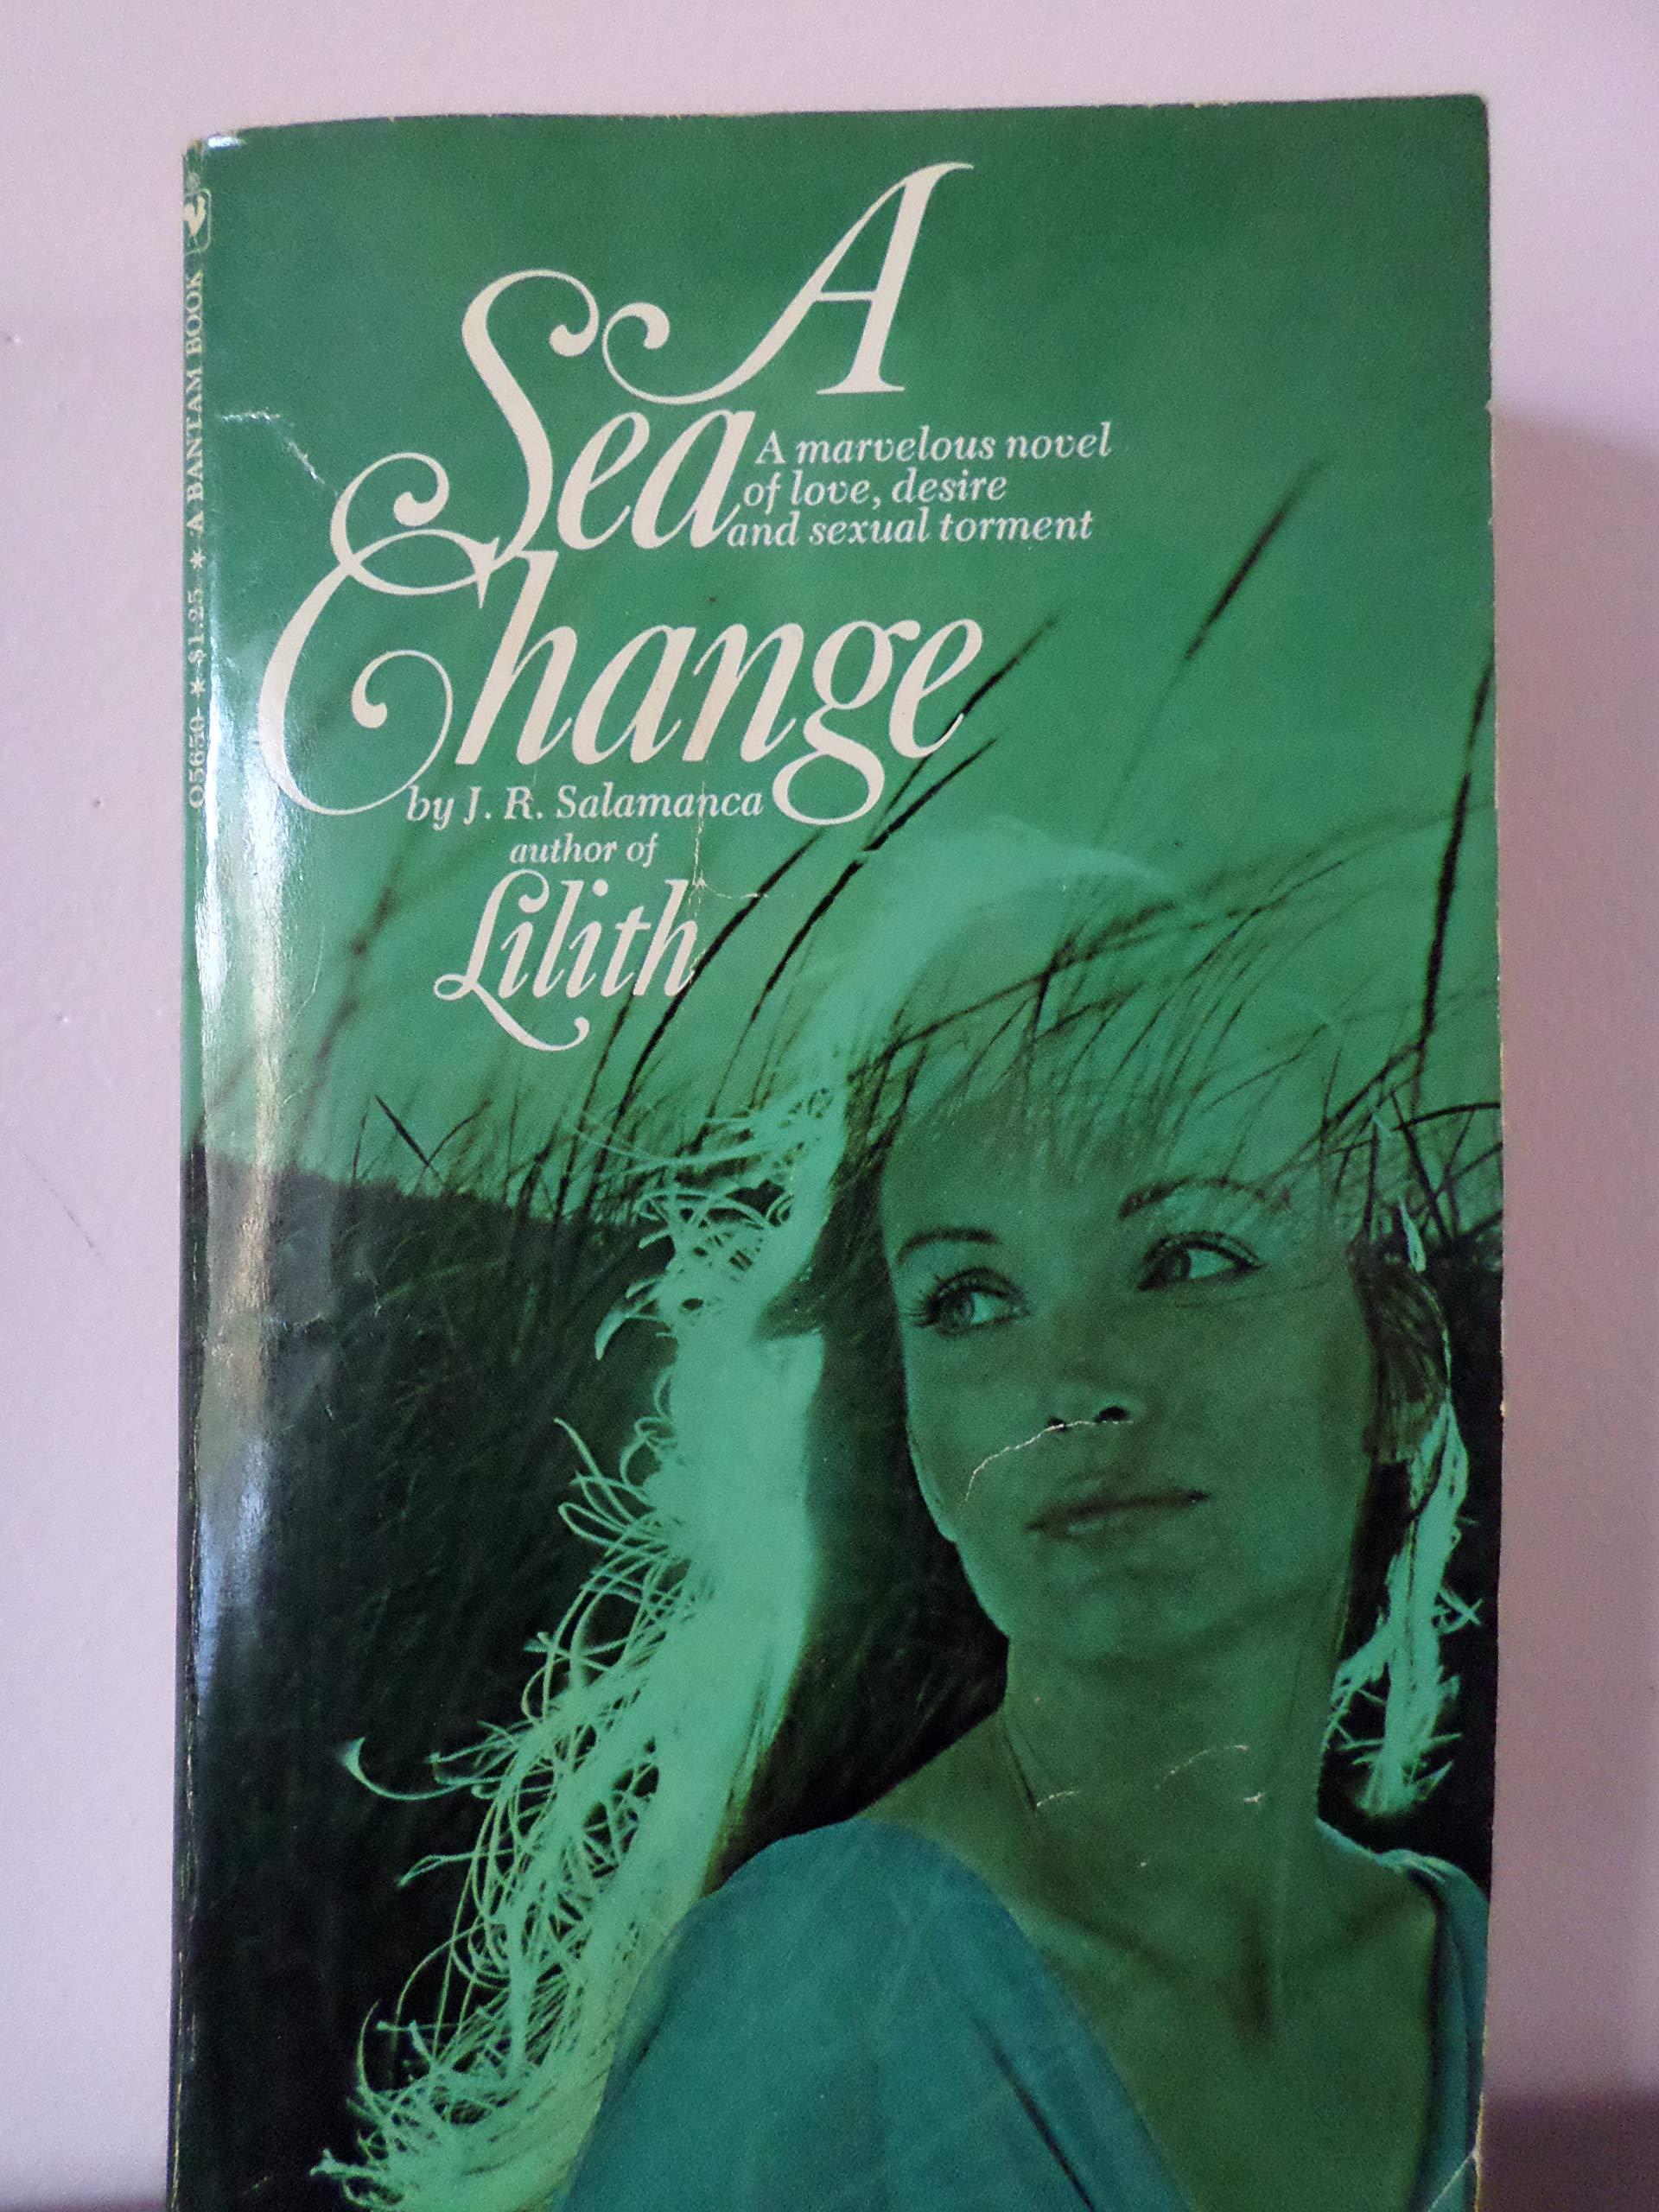 Amazon.com: A Sea Change: J. R. Salamanca: Books